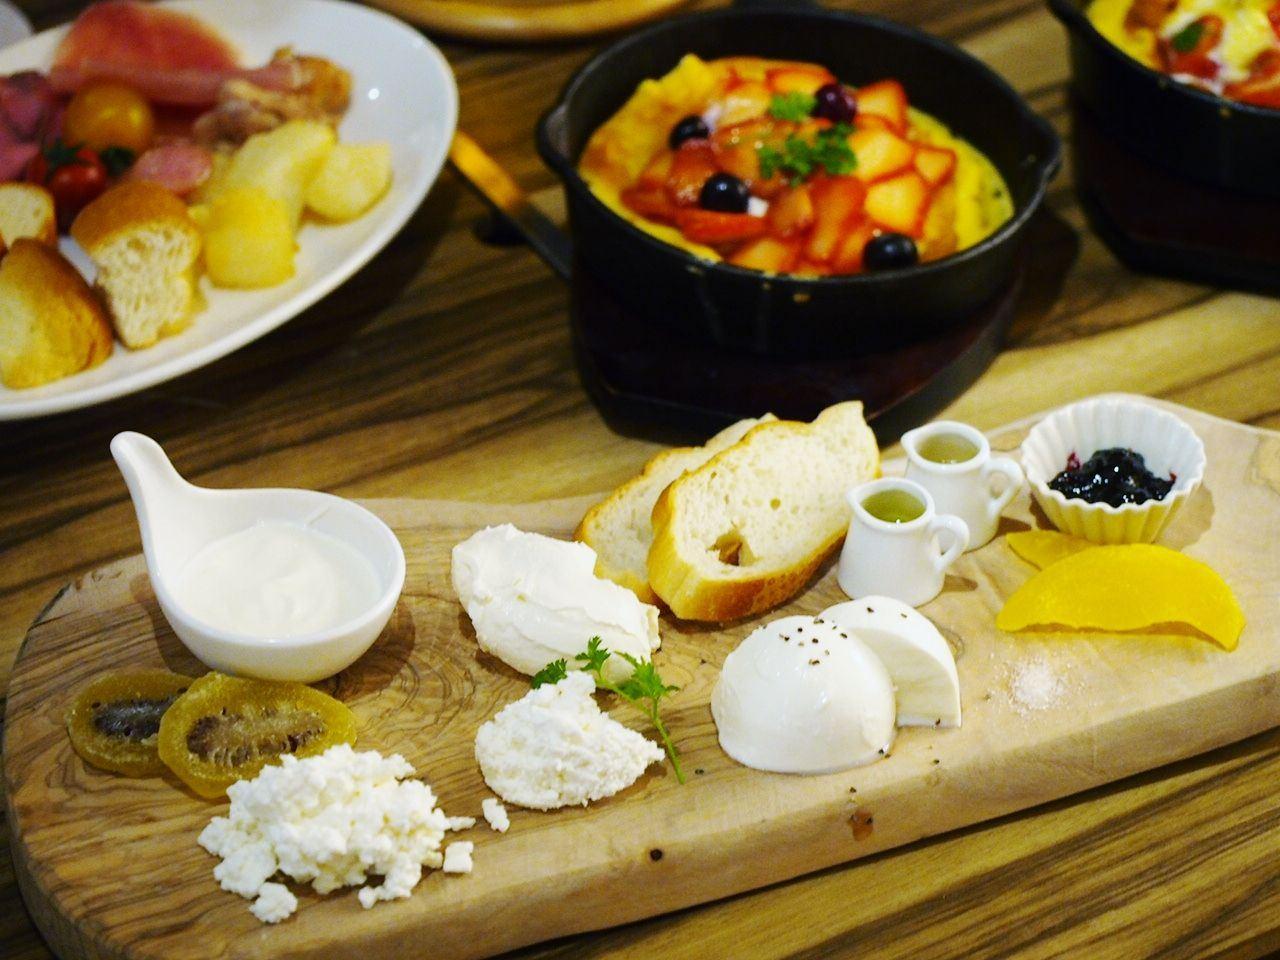 5 Varieties of House-Made Fresh Cheeses (1080 yen)